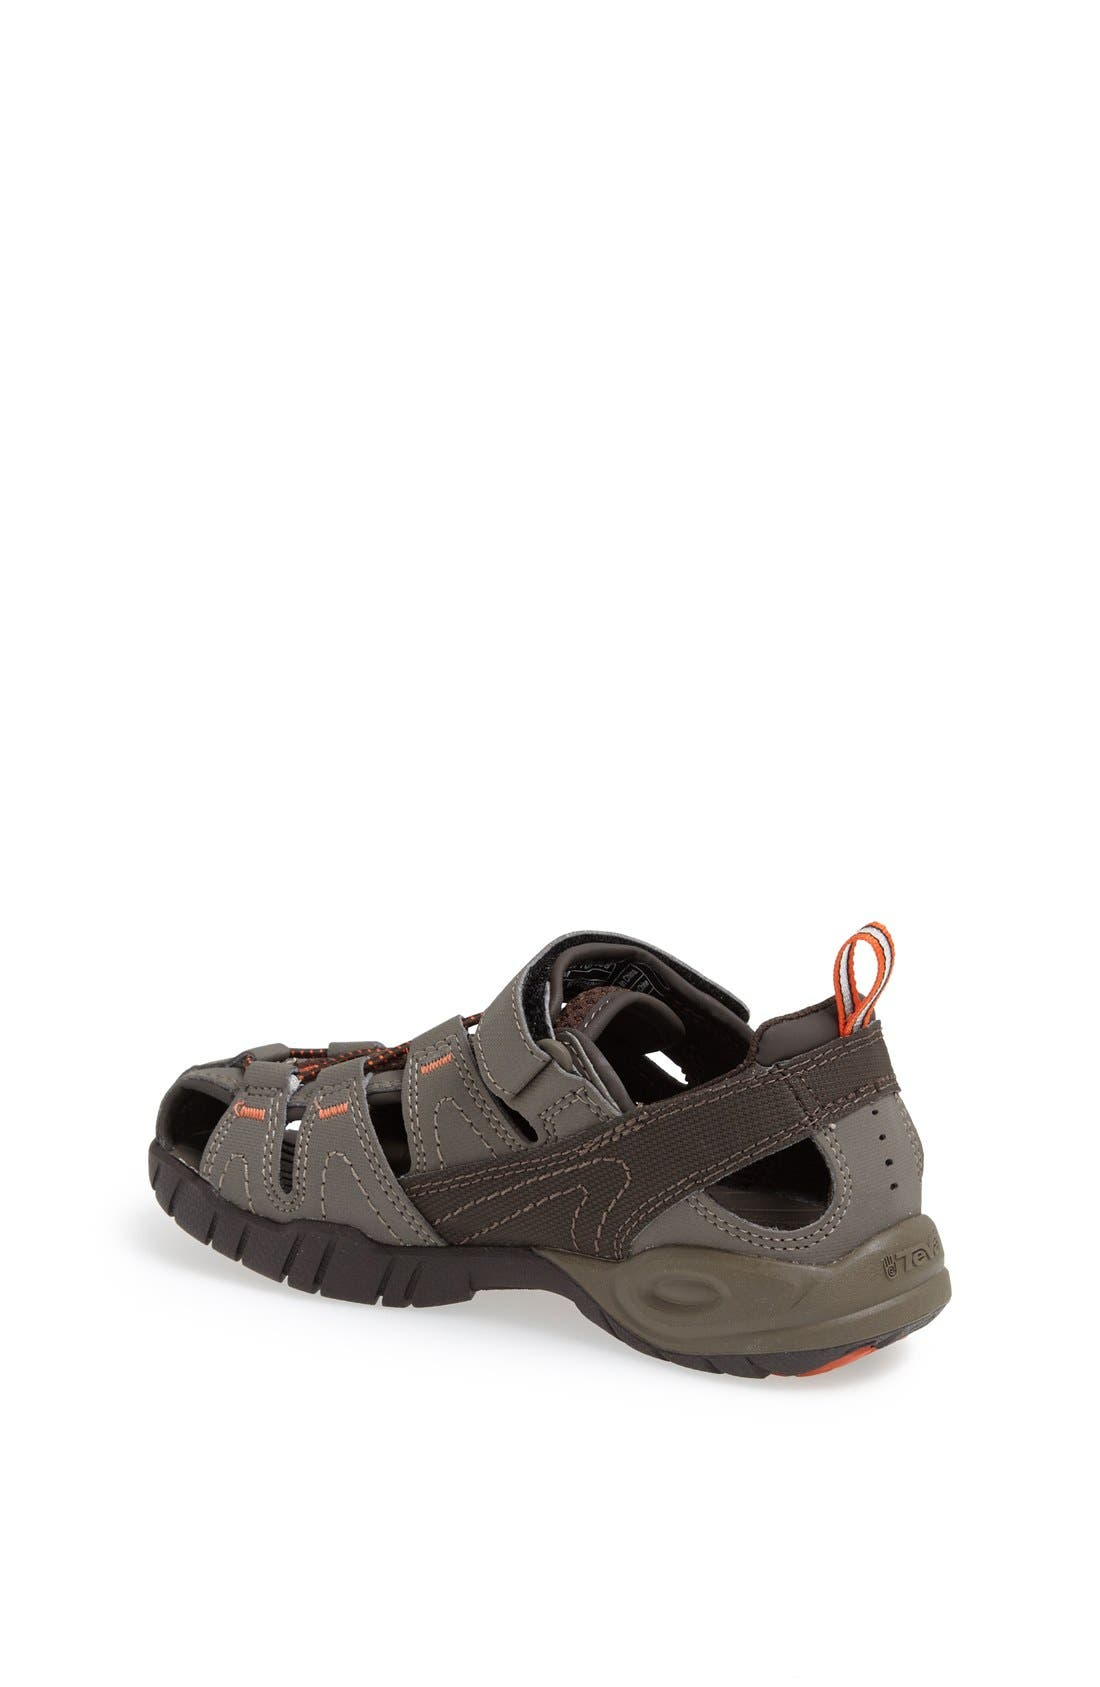 Alternate Image 2  - Teva 'Dozer 3' Sandal (Toddler, Little Kid & Big Kid)